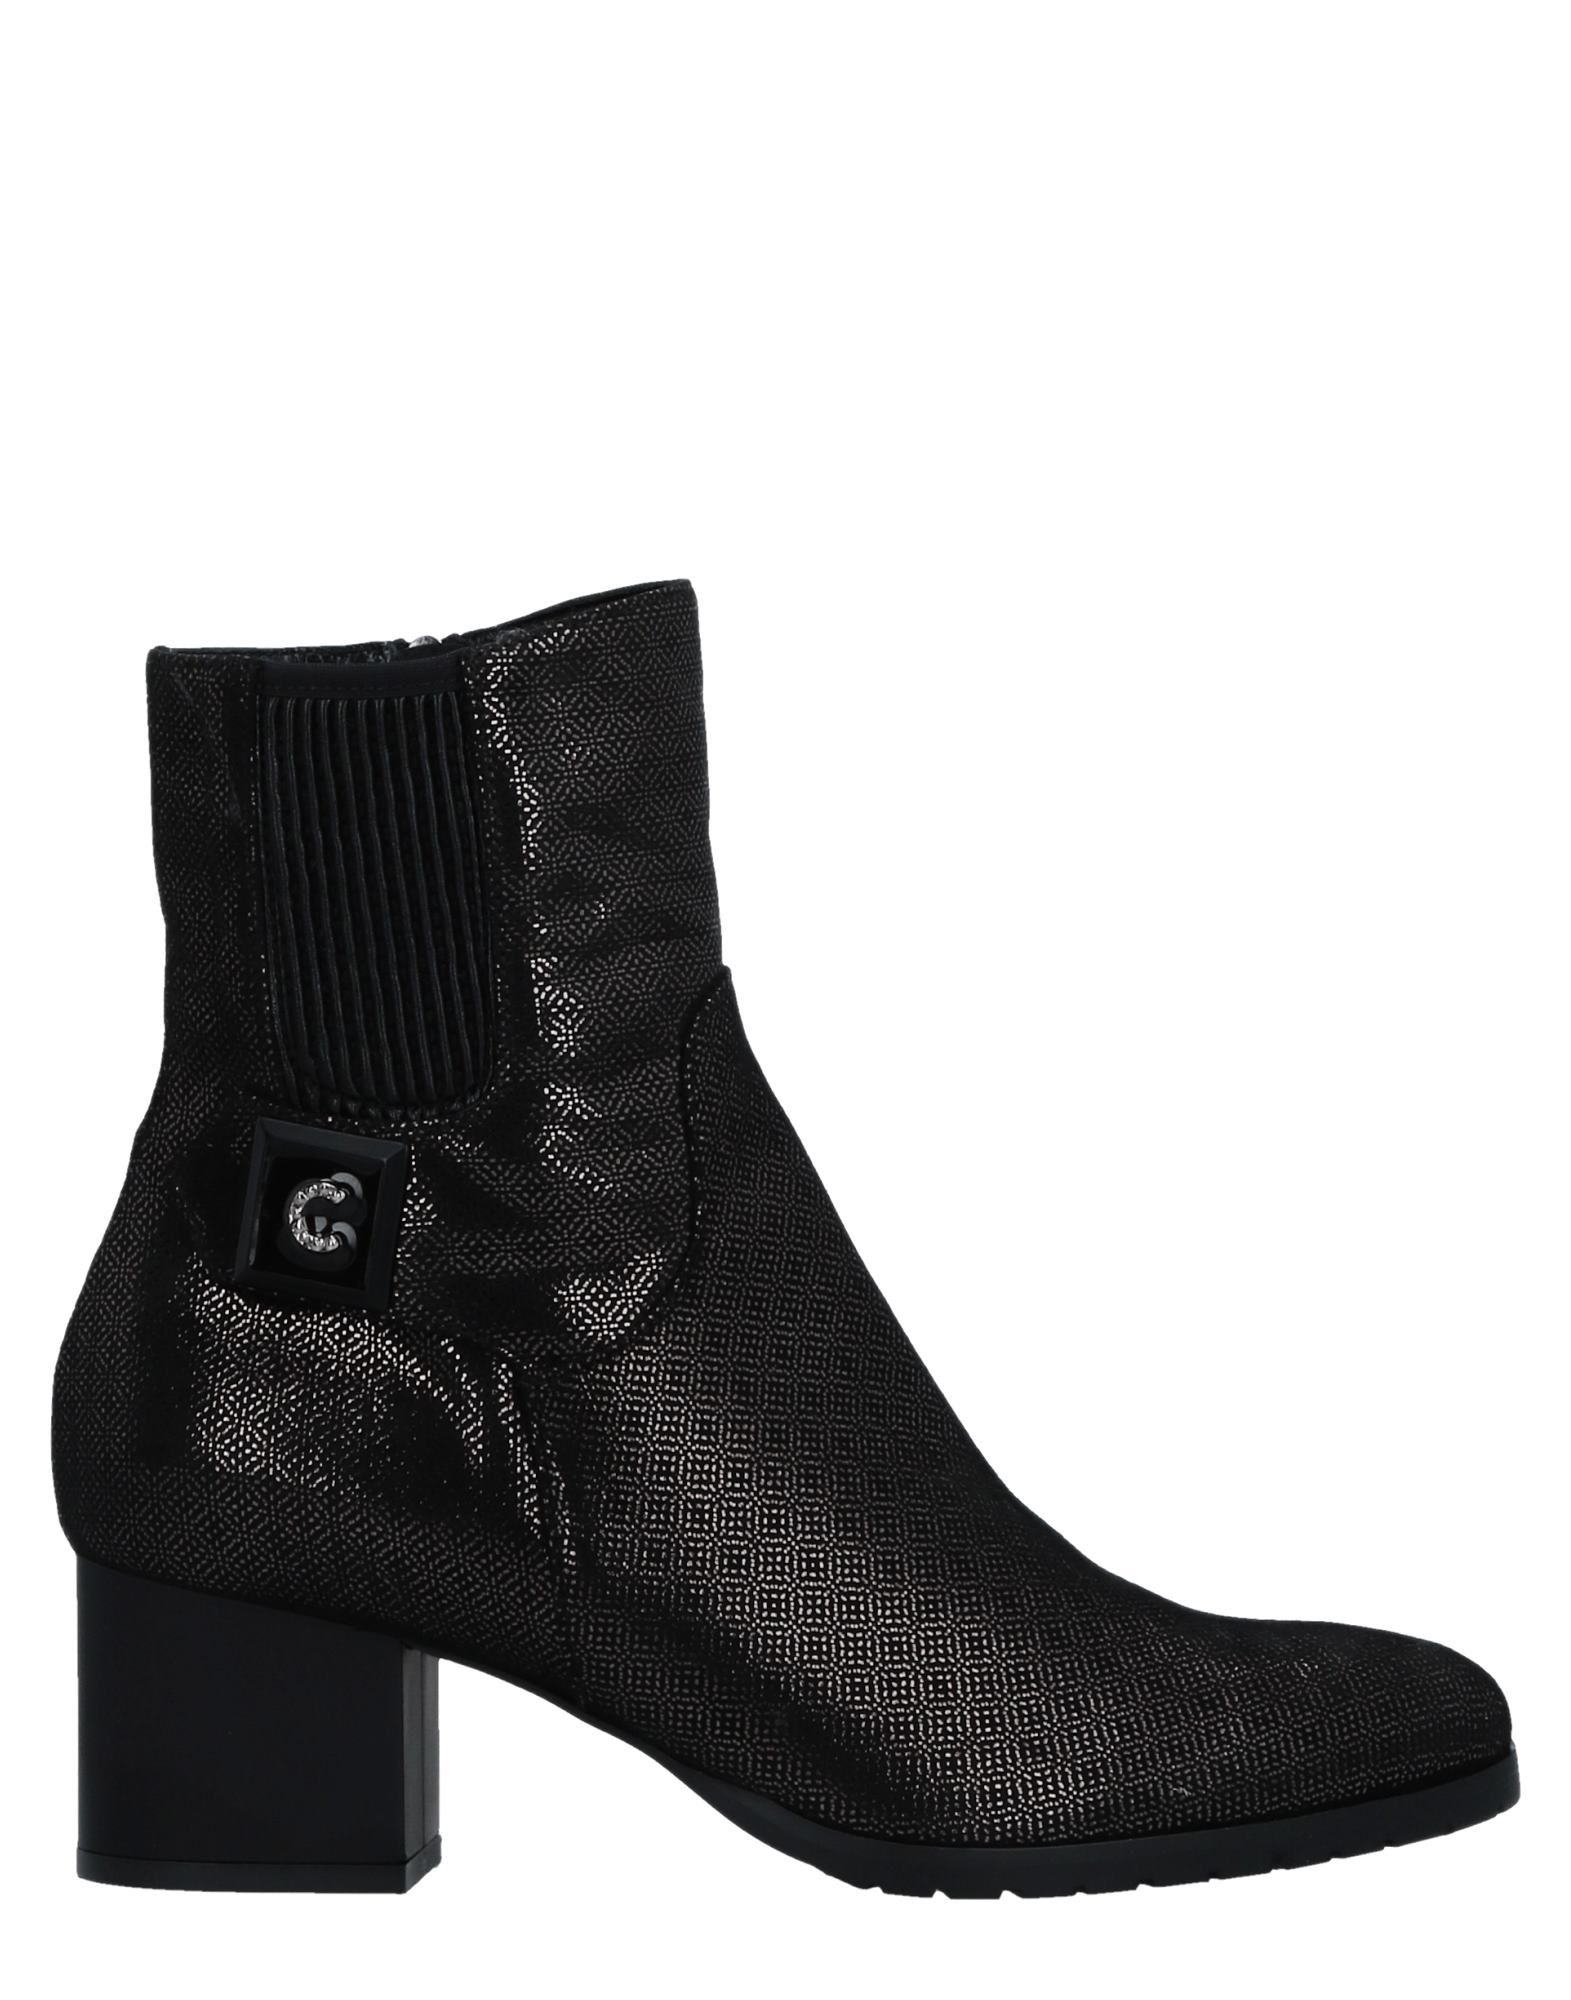 Rabatt Schuhe Schuhe Rabatt Conni Stiefelette Damen  11517840RP 675486